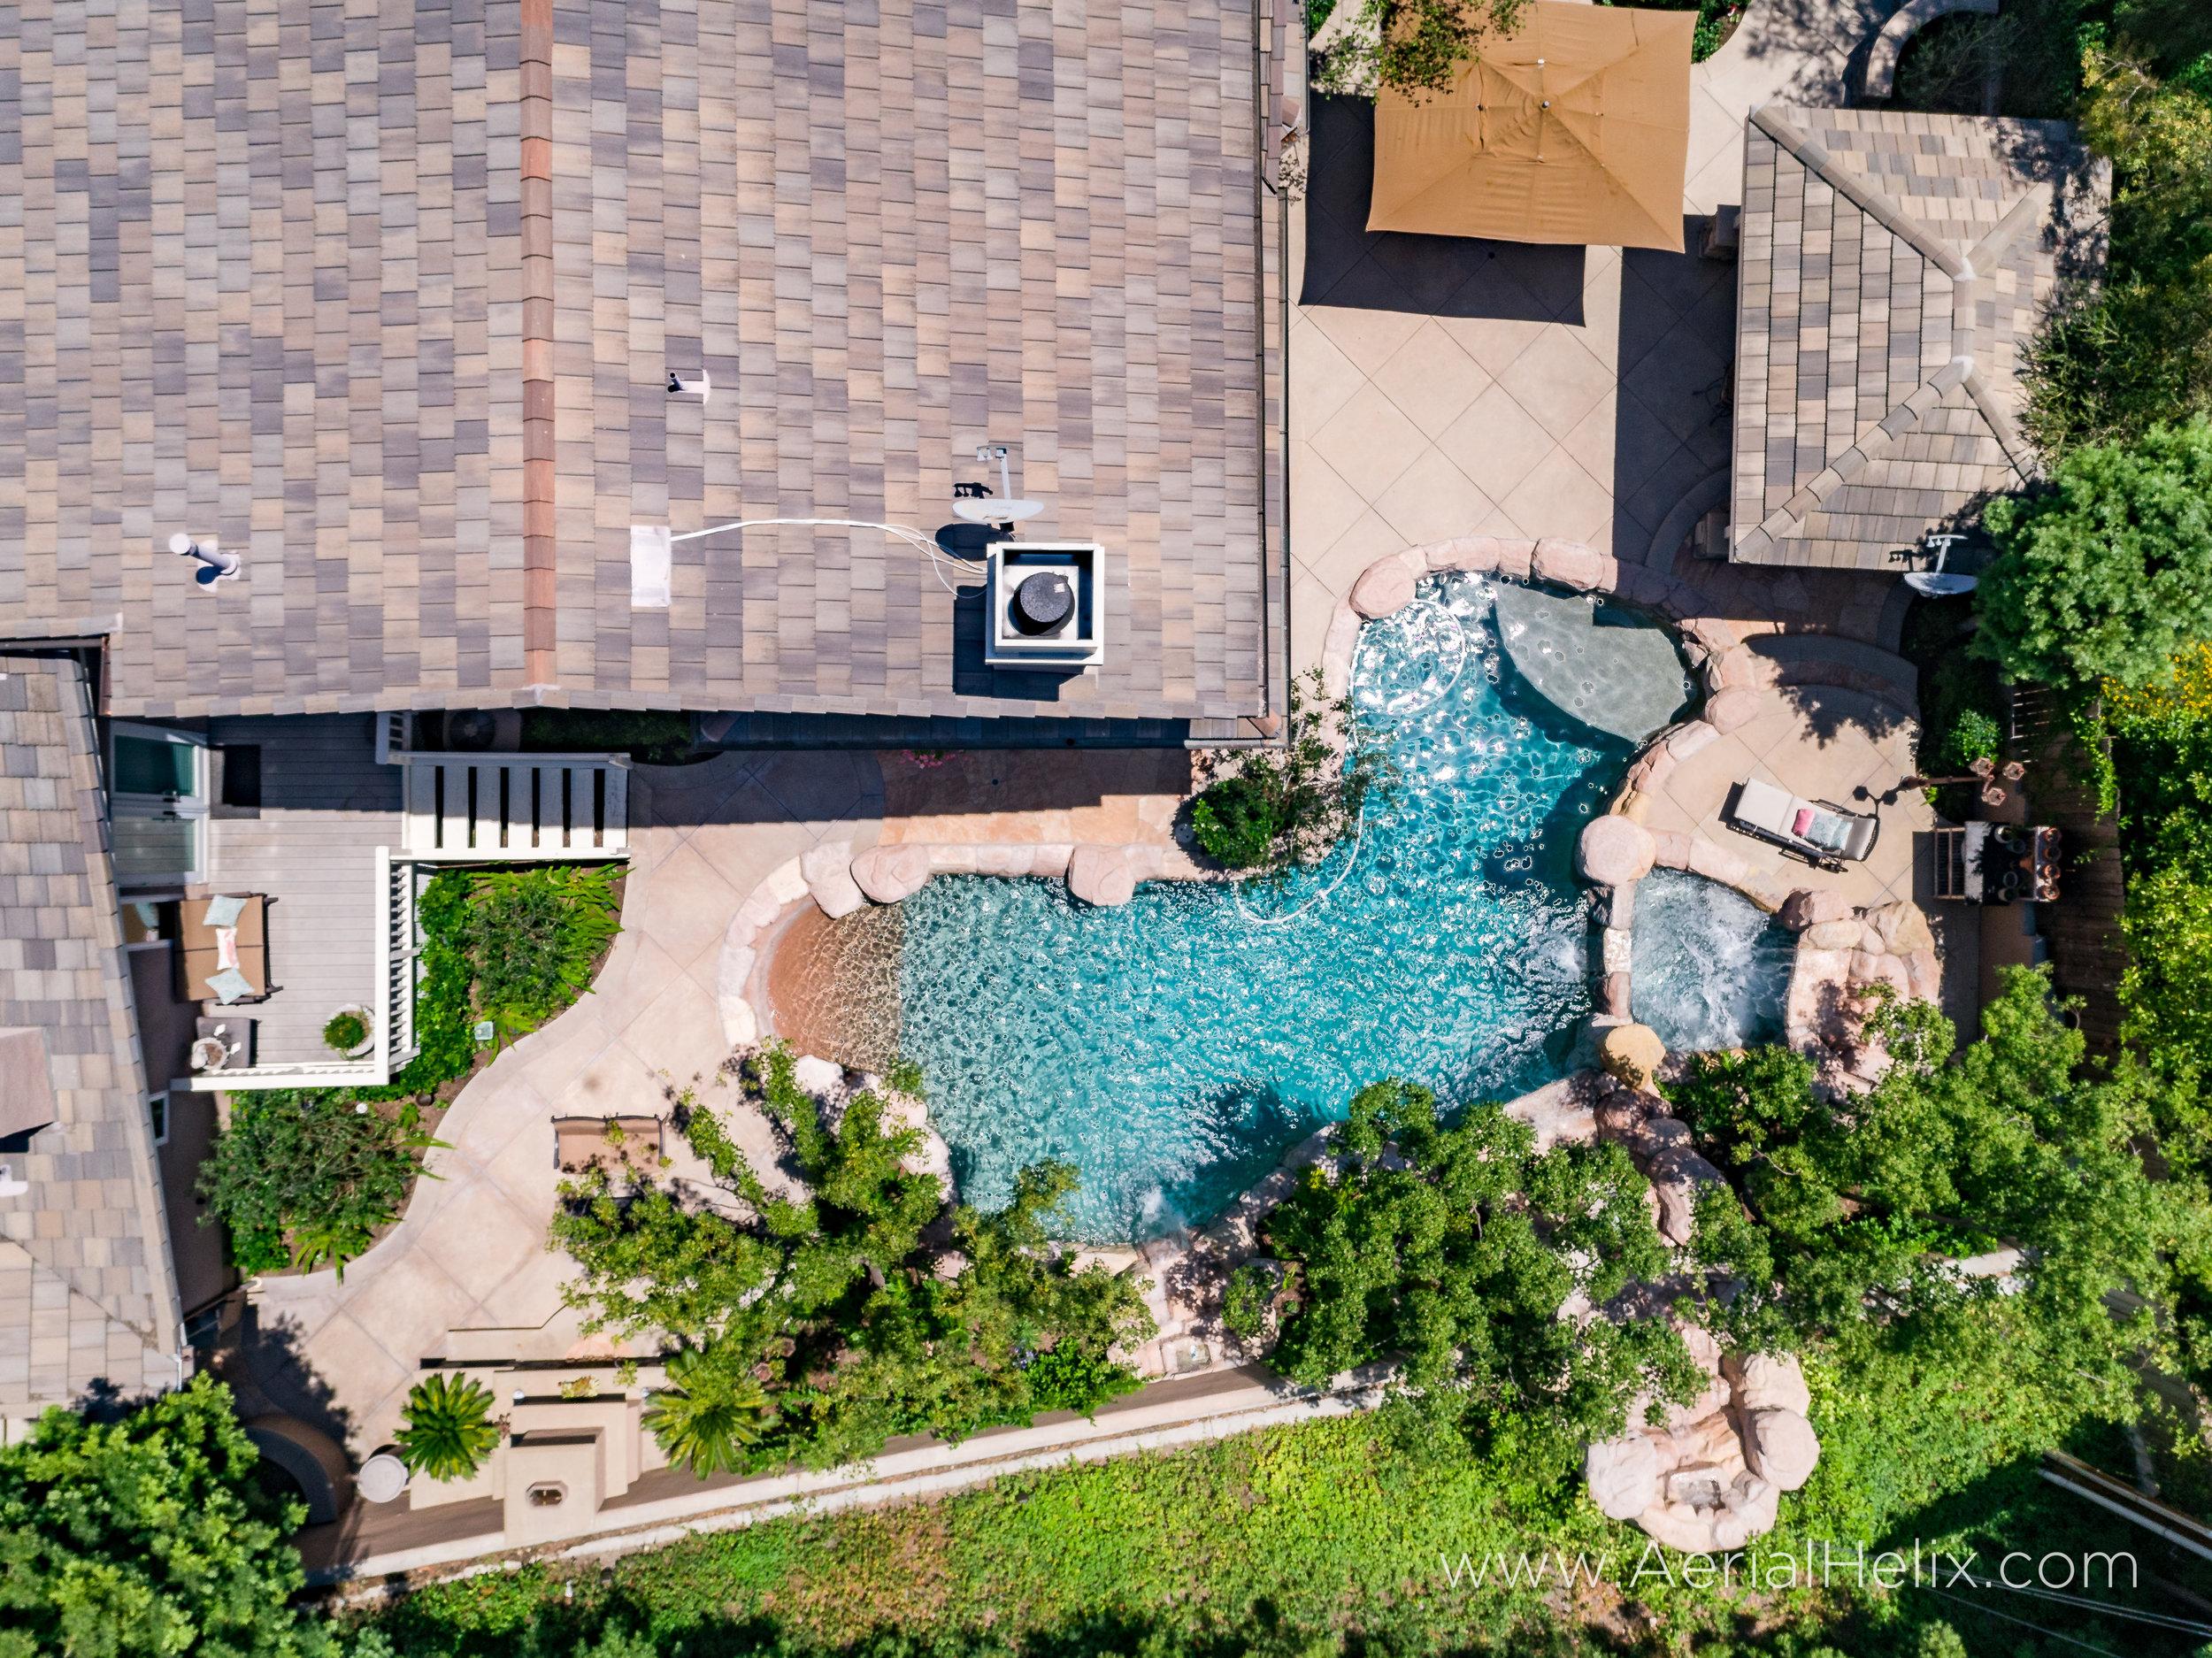 HELIX - Craftsman Lane - Real Estate Drone Photographer-23.jpg